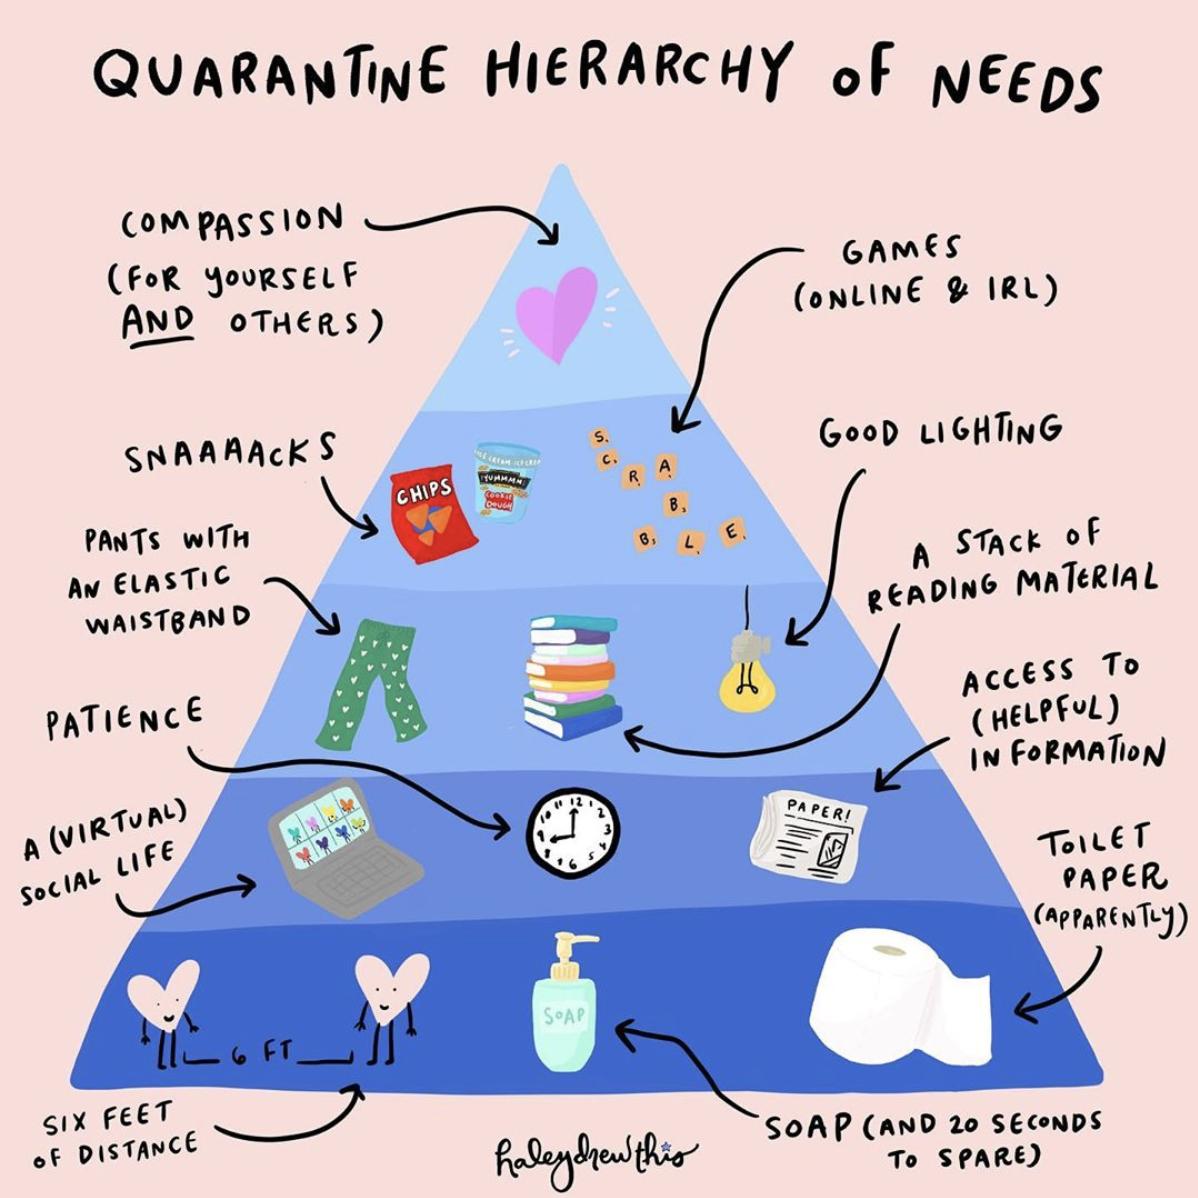 Quarantine Hierarchy of Needs by @haleydrewthis